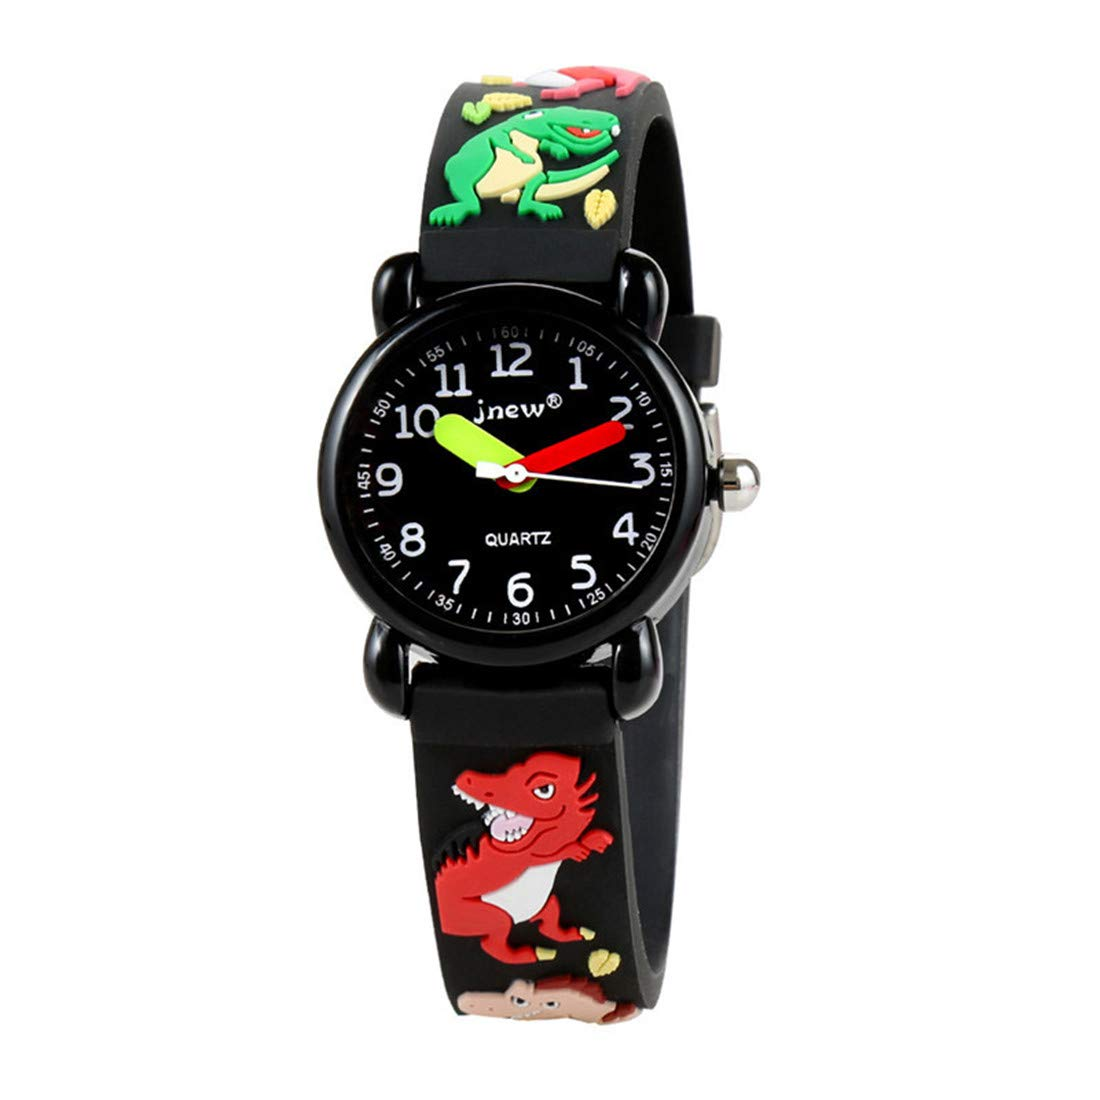 Souarts-Kinder-Armbanduhr-Cartoon-3D-Dinosaurier-Muster-Silikon-Wasserdicht-Quarzuhr-Geschenke-Schwarz